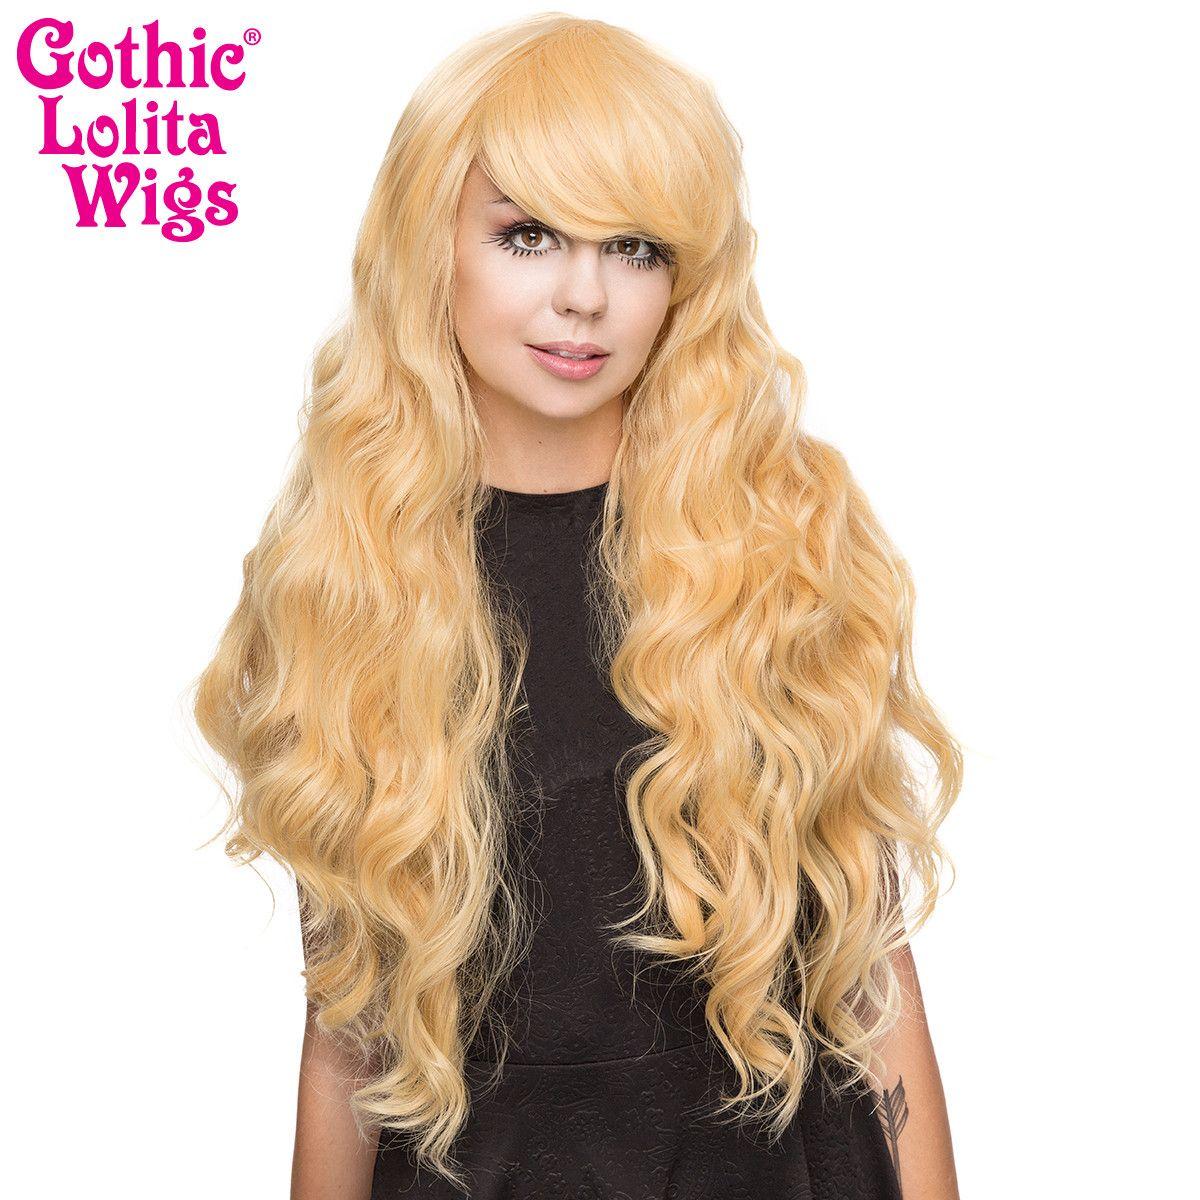 Gothic Lolita Wigs® <br> Classic Wavy Lolita™ Collection - Tokyo Blonde-00188